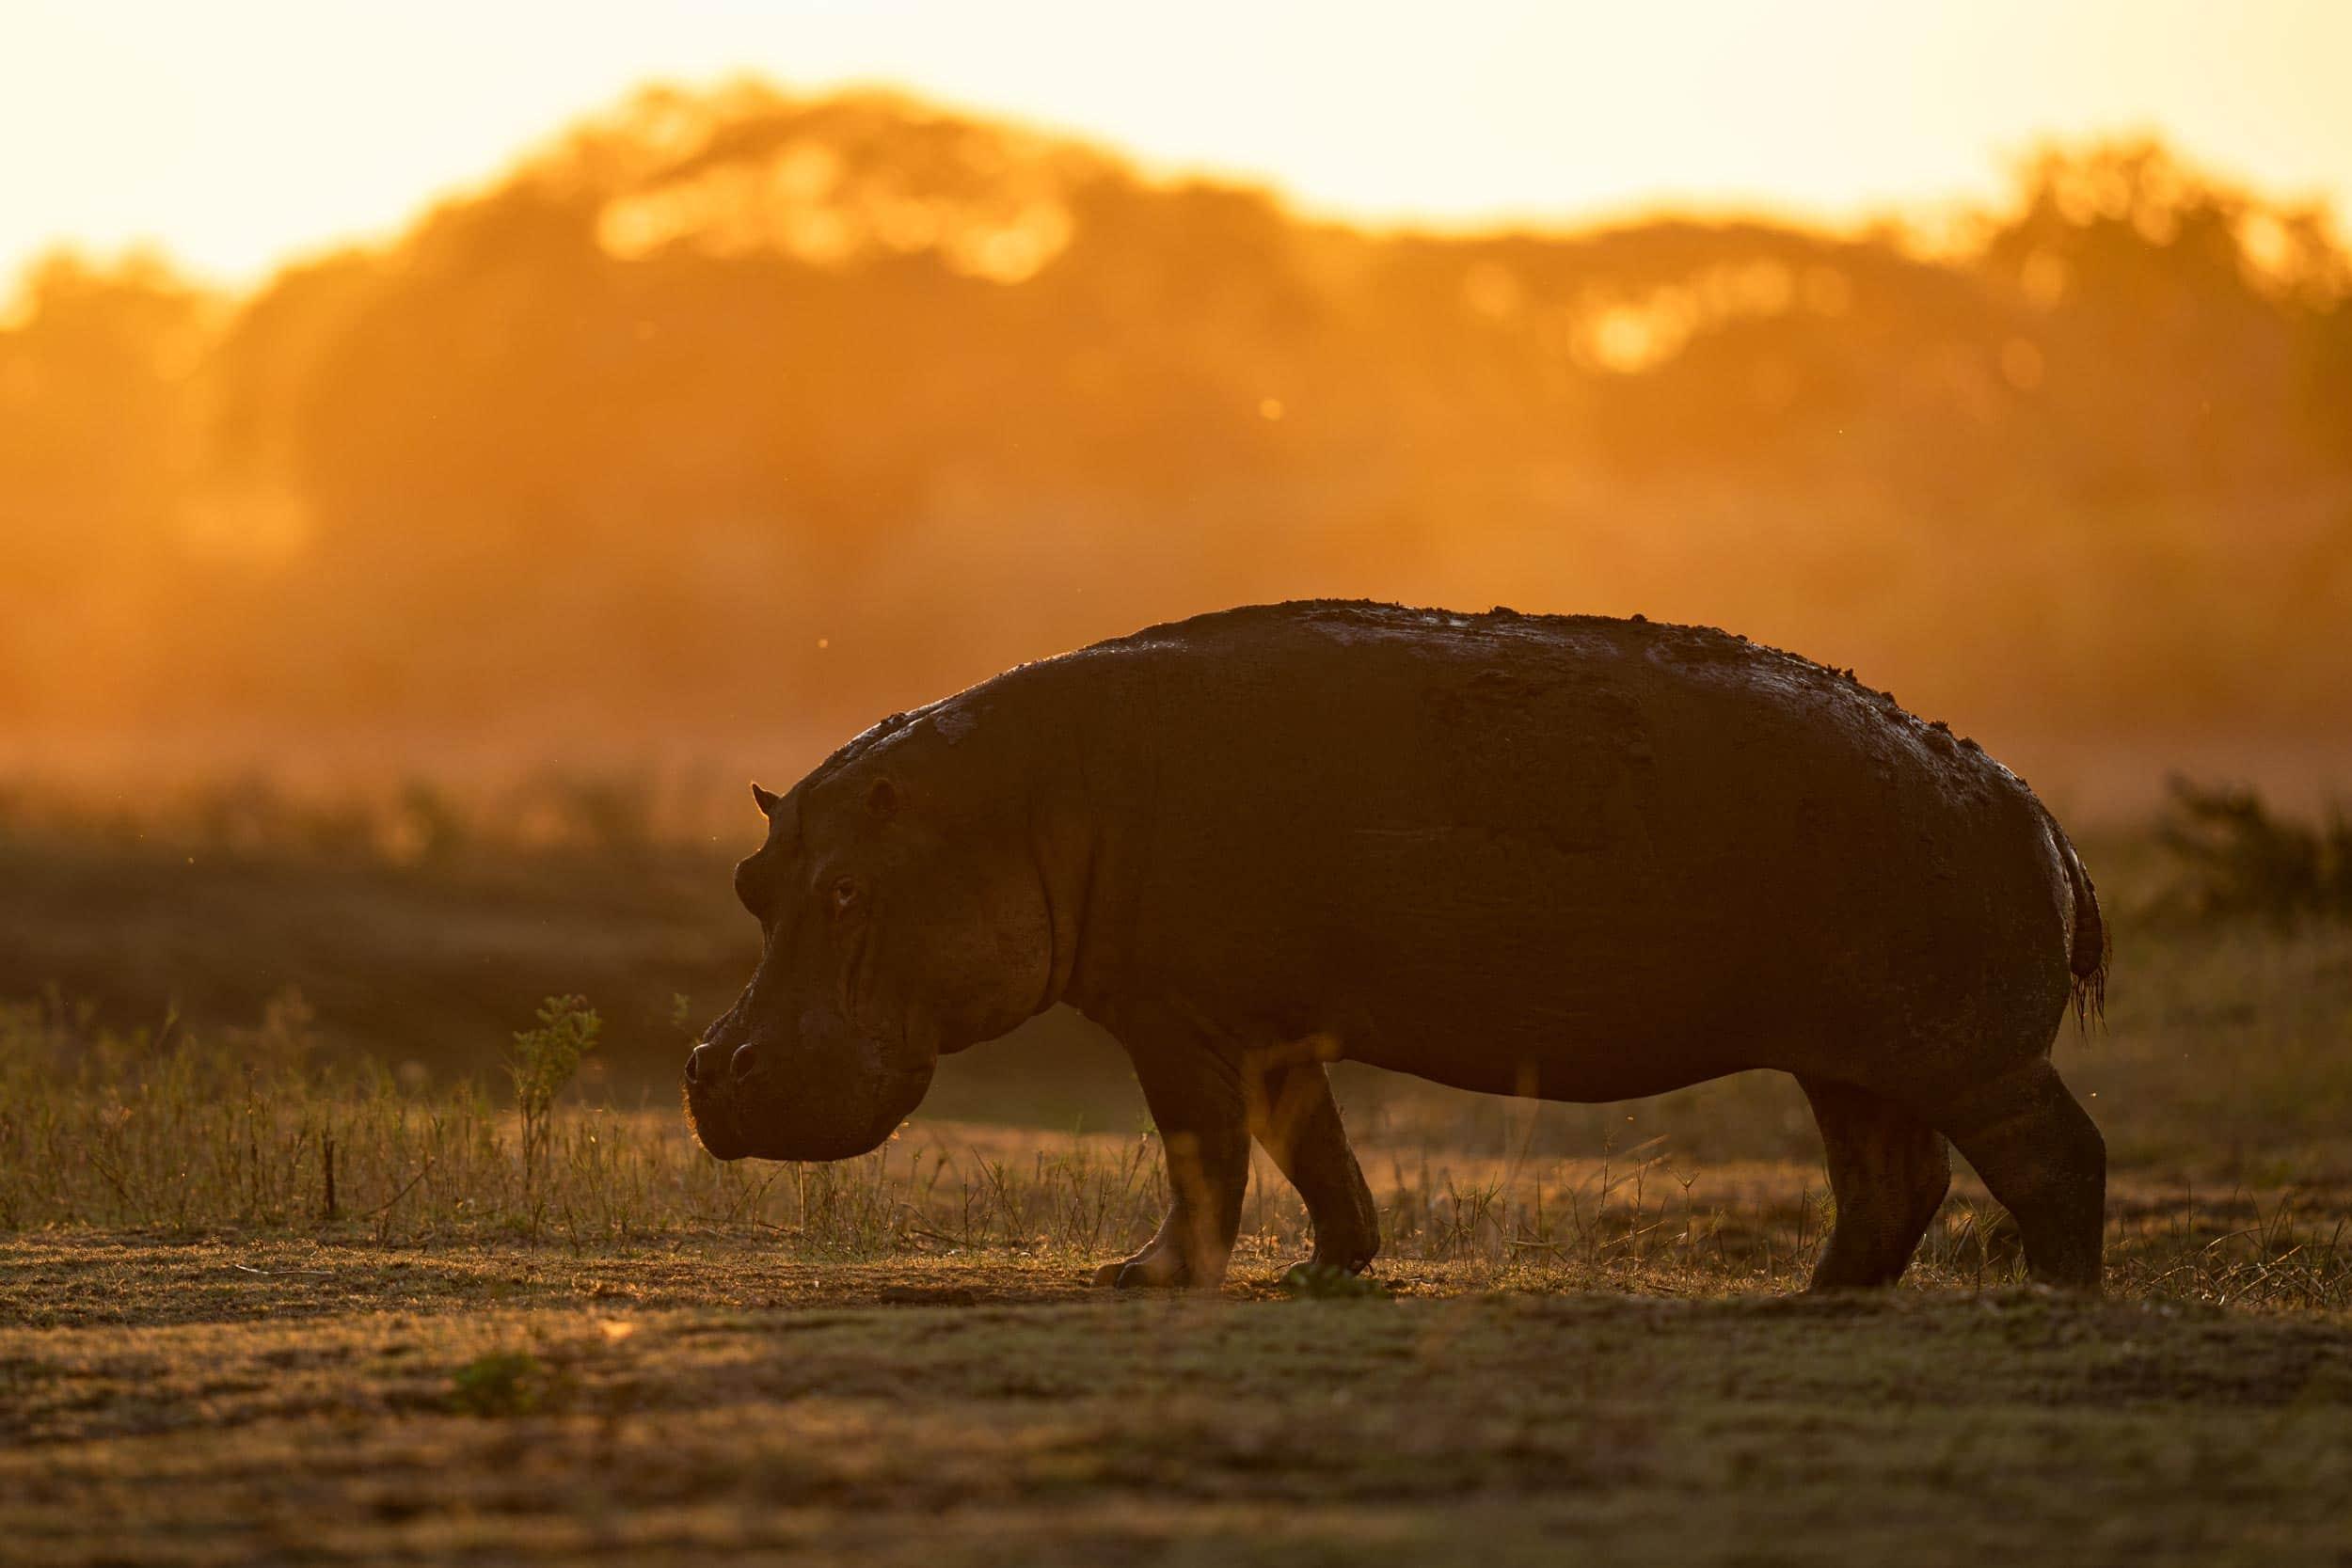 Hippopotamus photographed in Katavi nationalpark in Tanzania